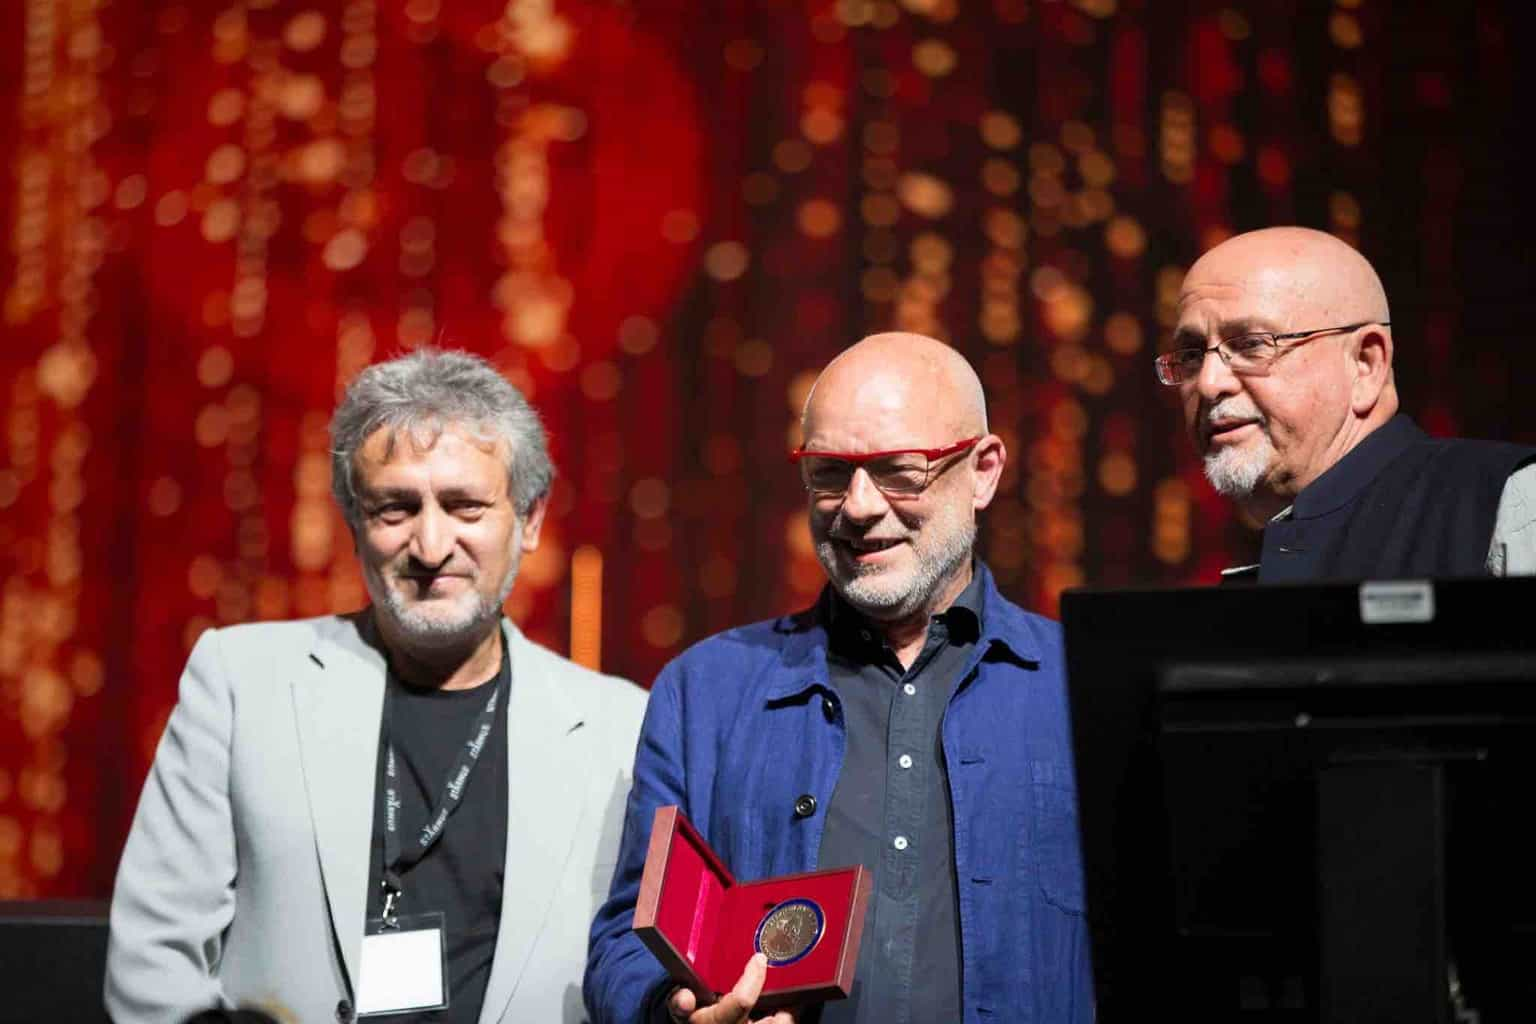 Brian Eno Musician receives Starmus Award